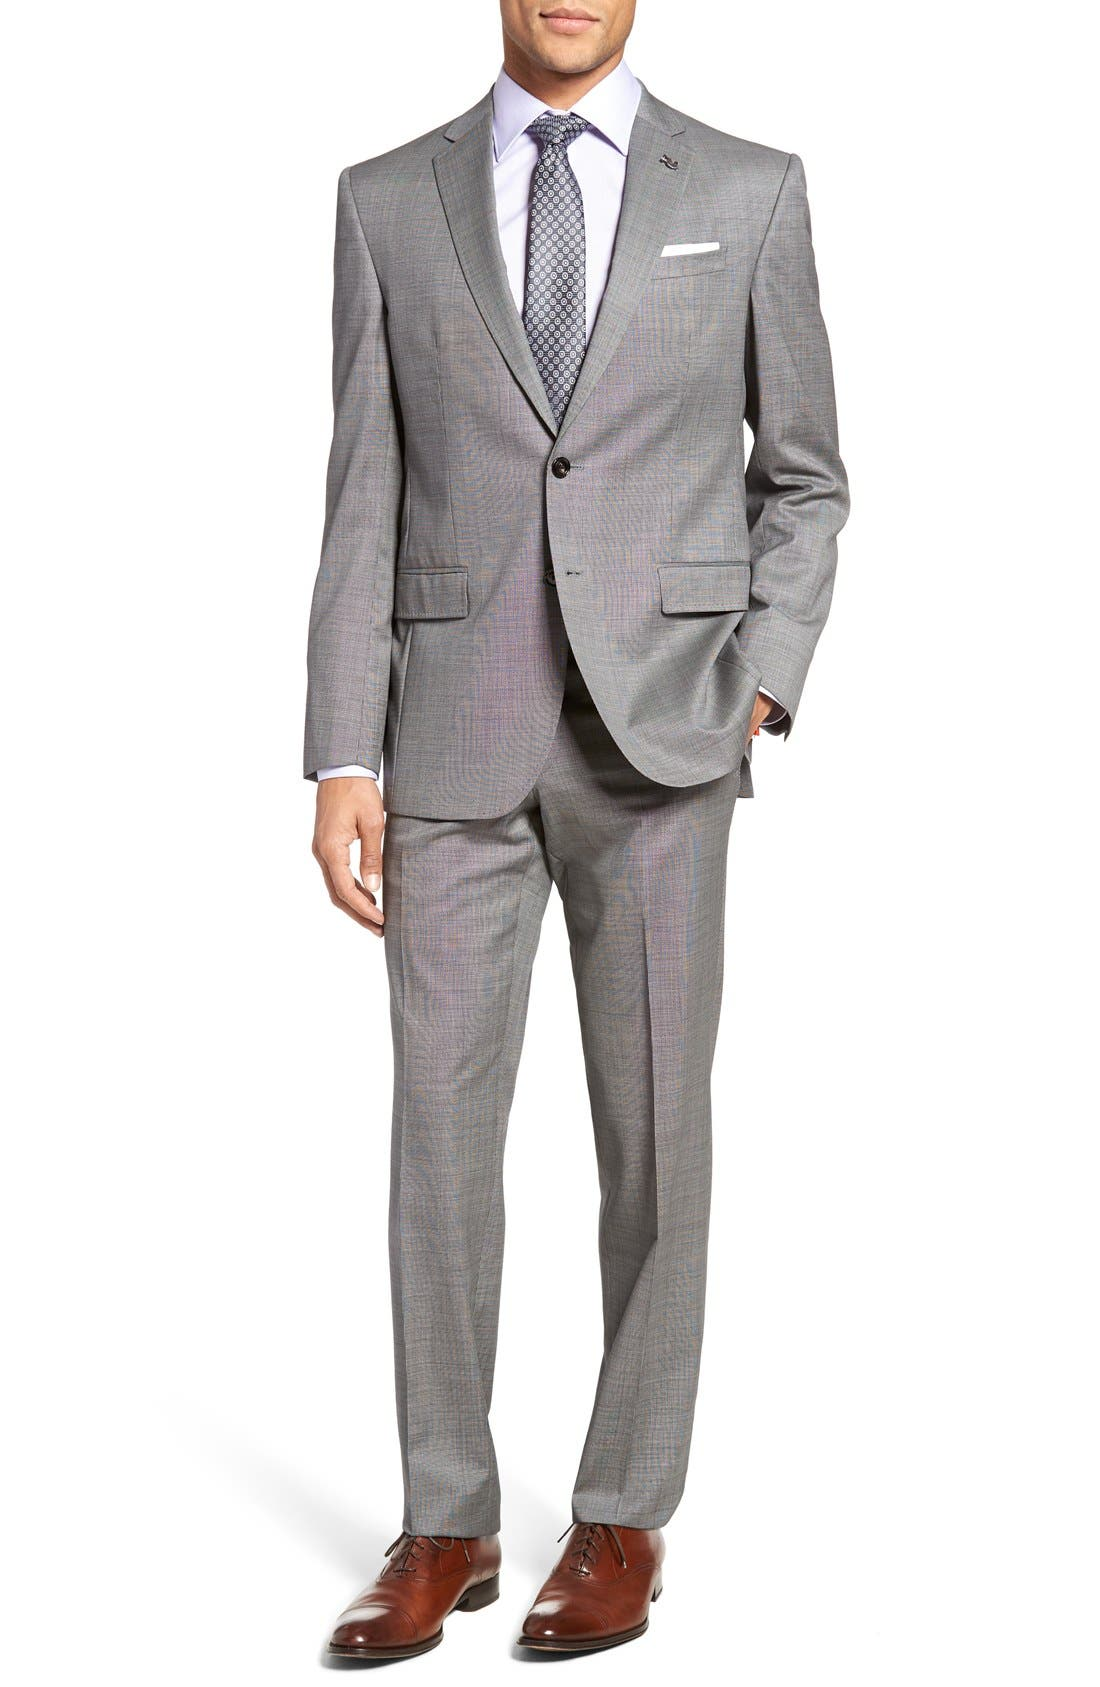 Jay Trim Fit Solid Wool Suit,                         Main,                         color, LIGHT GREY